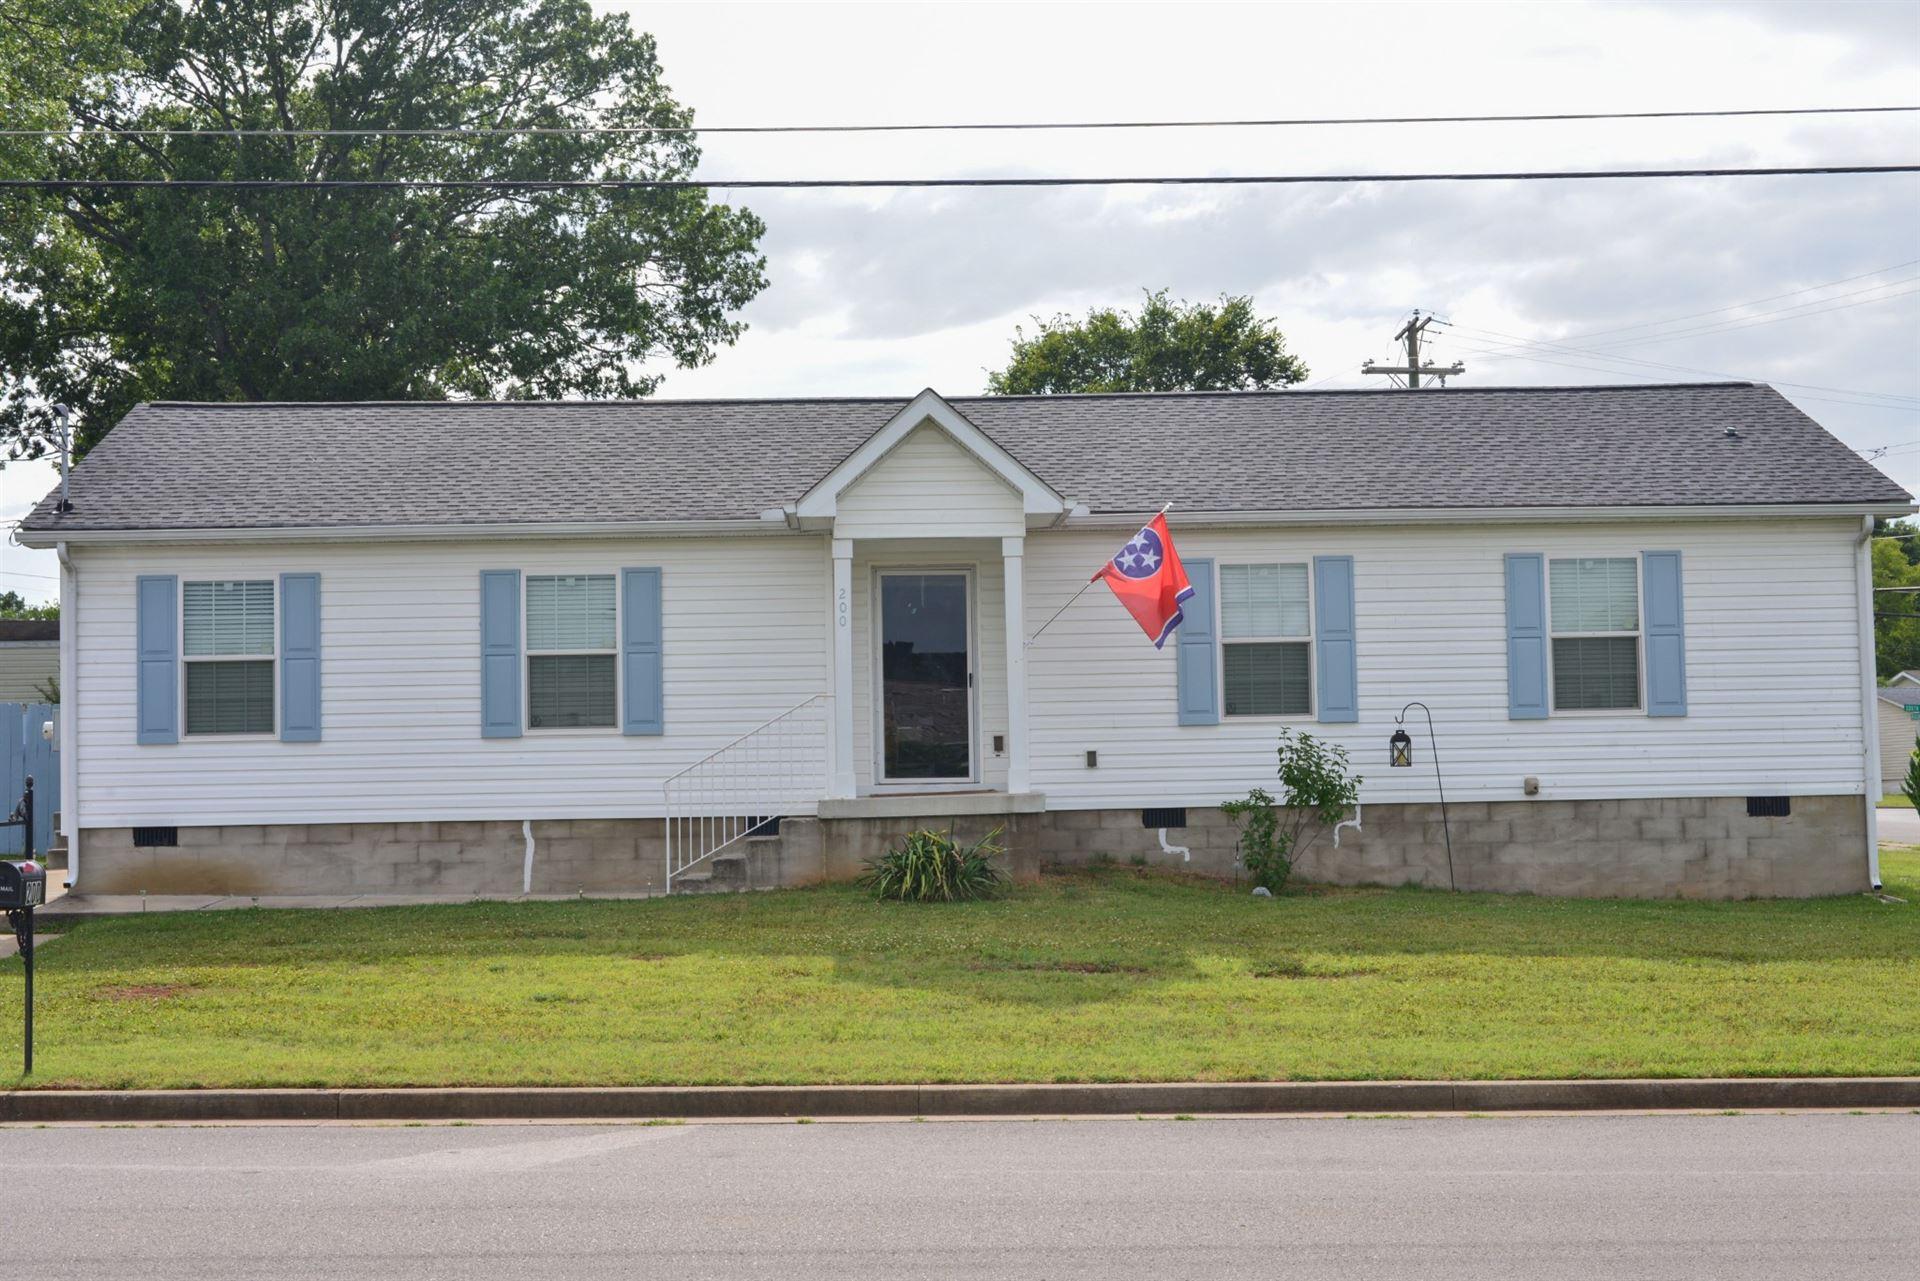 2101 Beachfront Ave, Antioch, TN 37013 - MLS#: 2272747